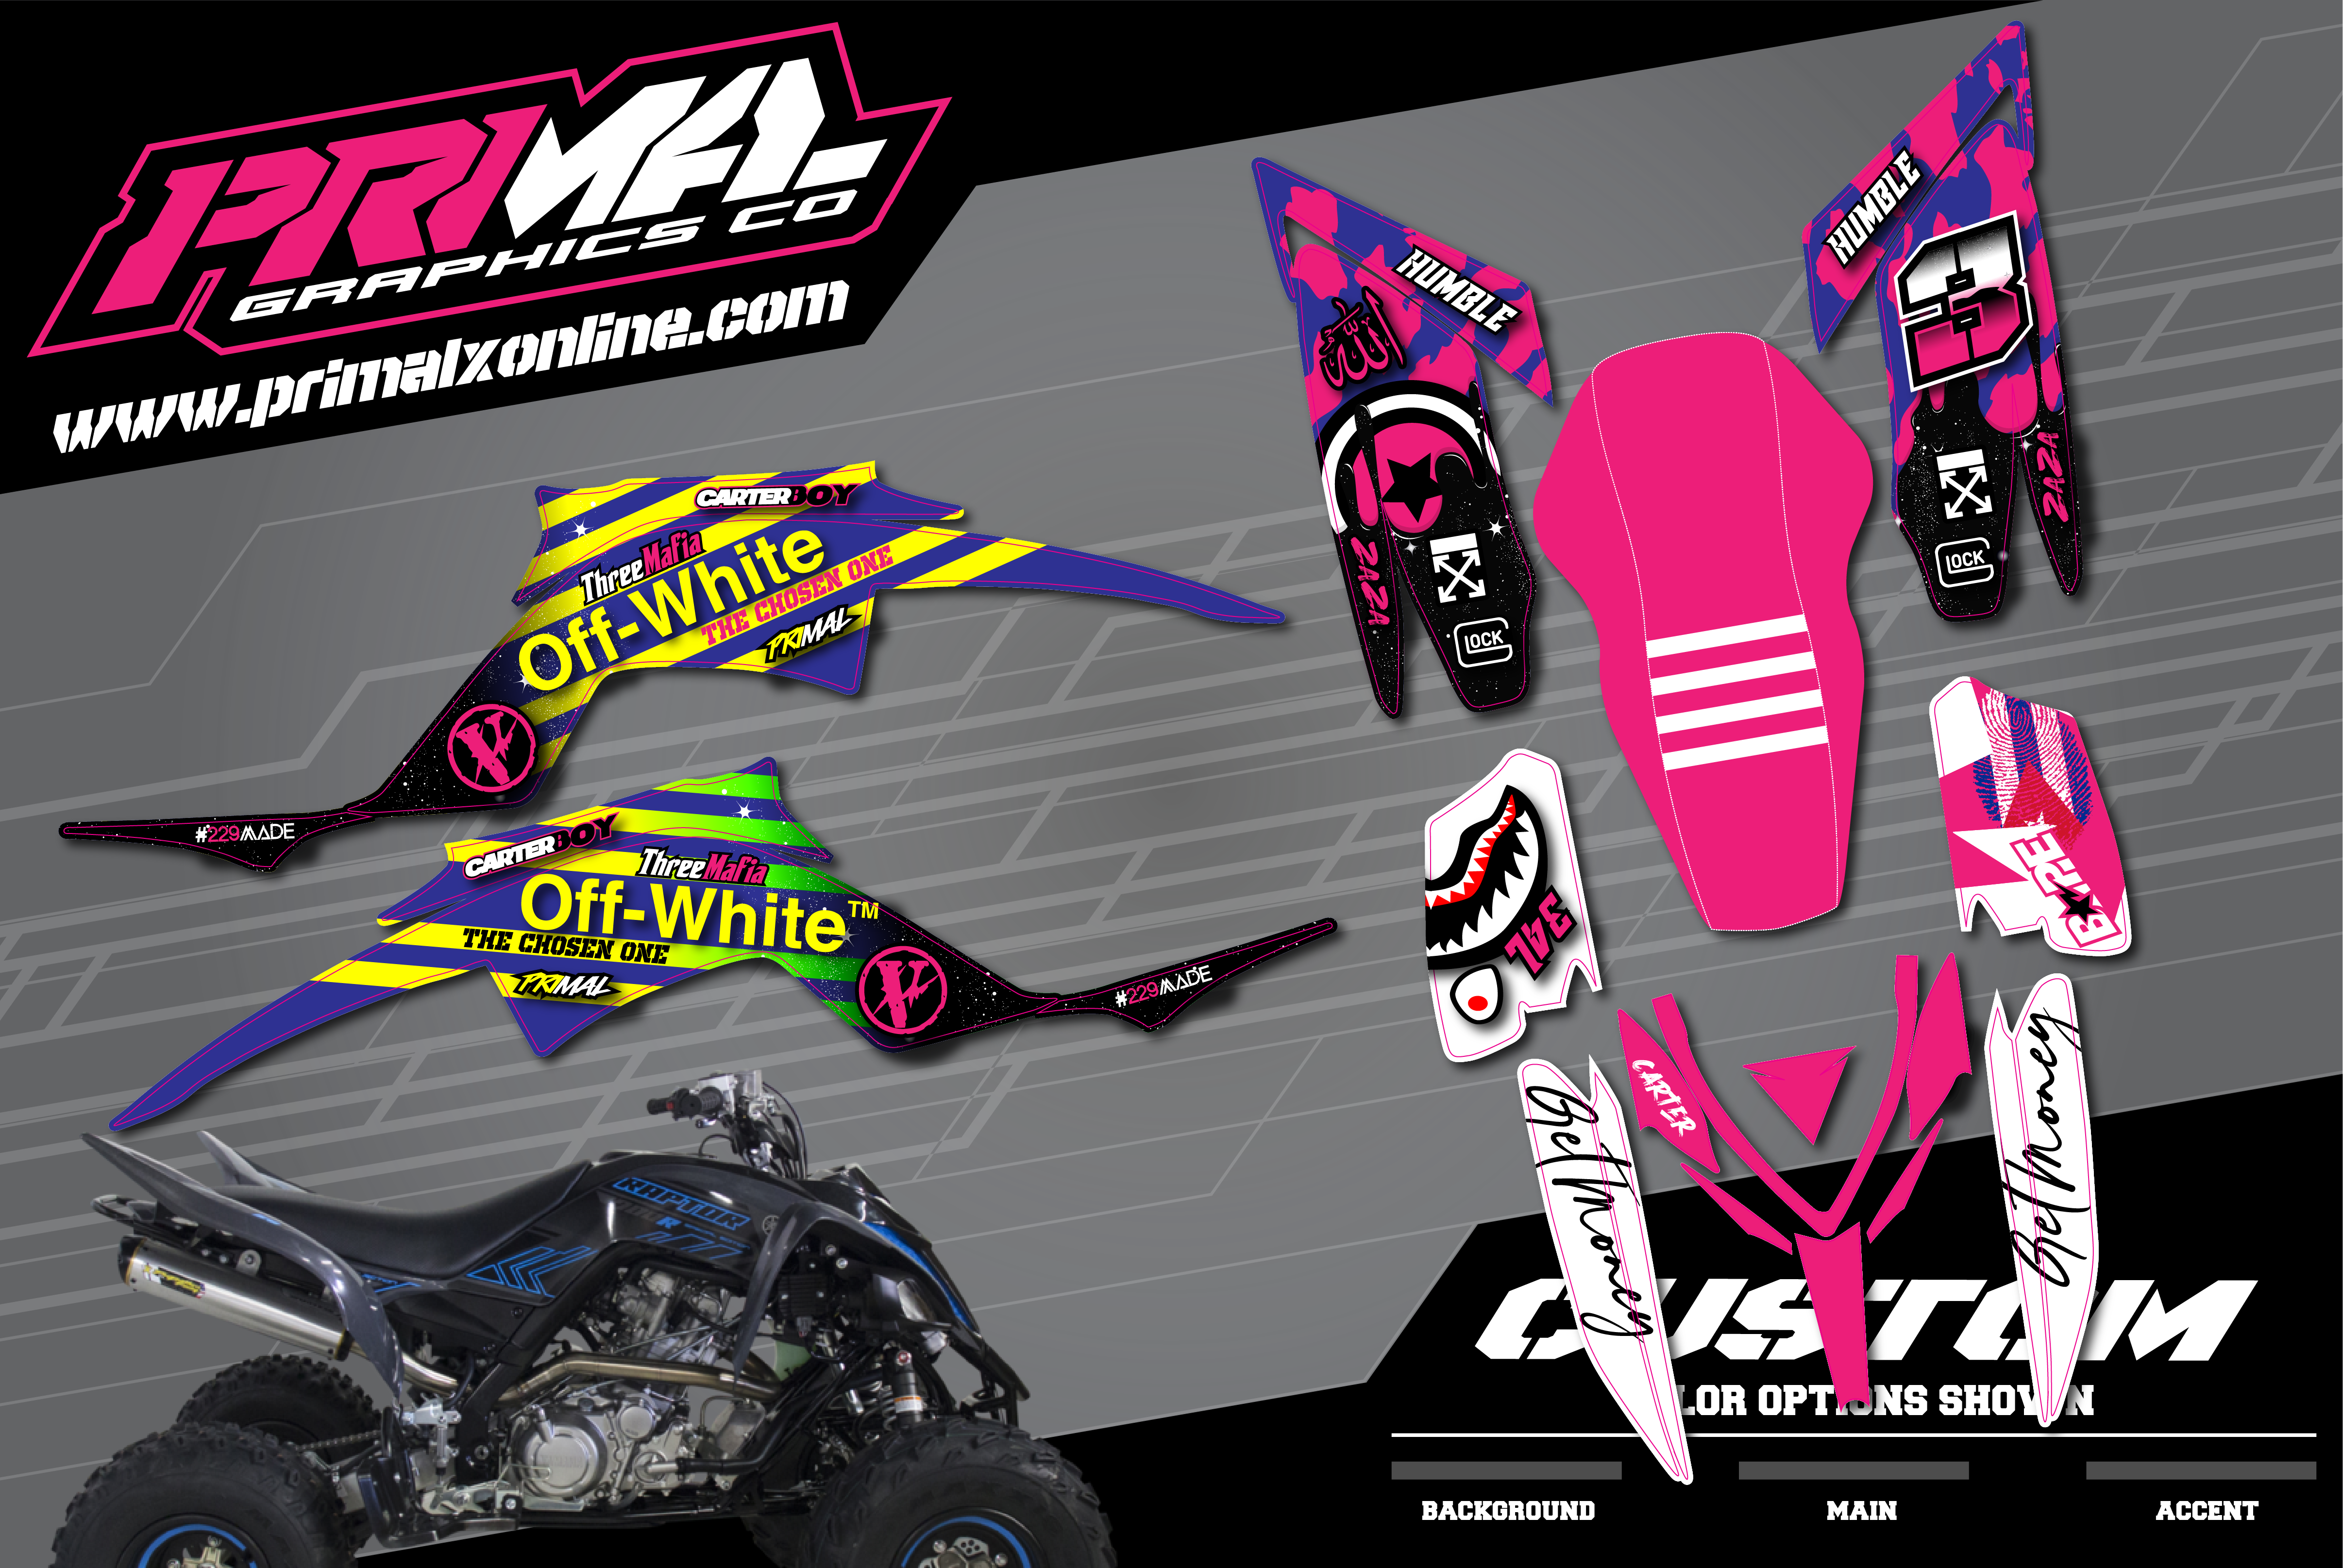 1_PRIMAL-X-MOTORSPORTS-PRIMAL-GRAPHICS-CO-YAMAHA-RAPTOR-700-CHARMCITY-KINGS-MX-GRAPHICS-MX-DECALS-01